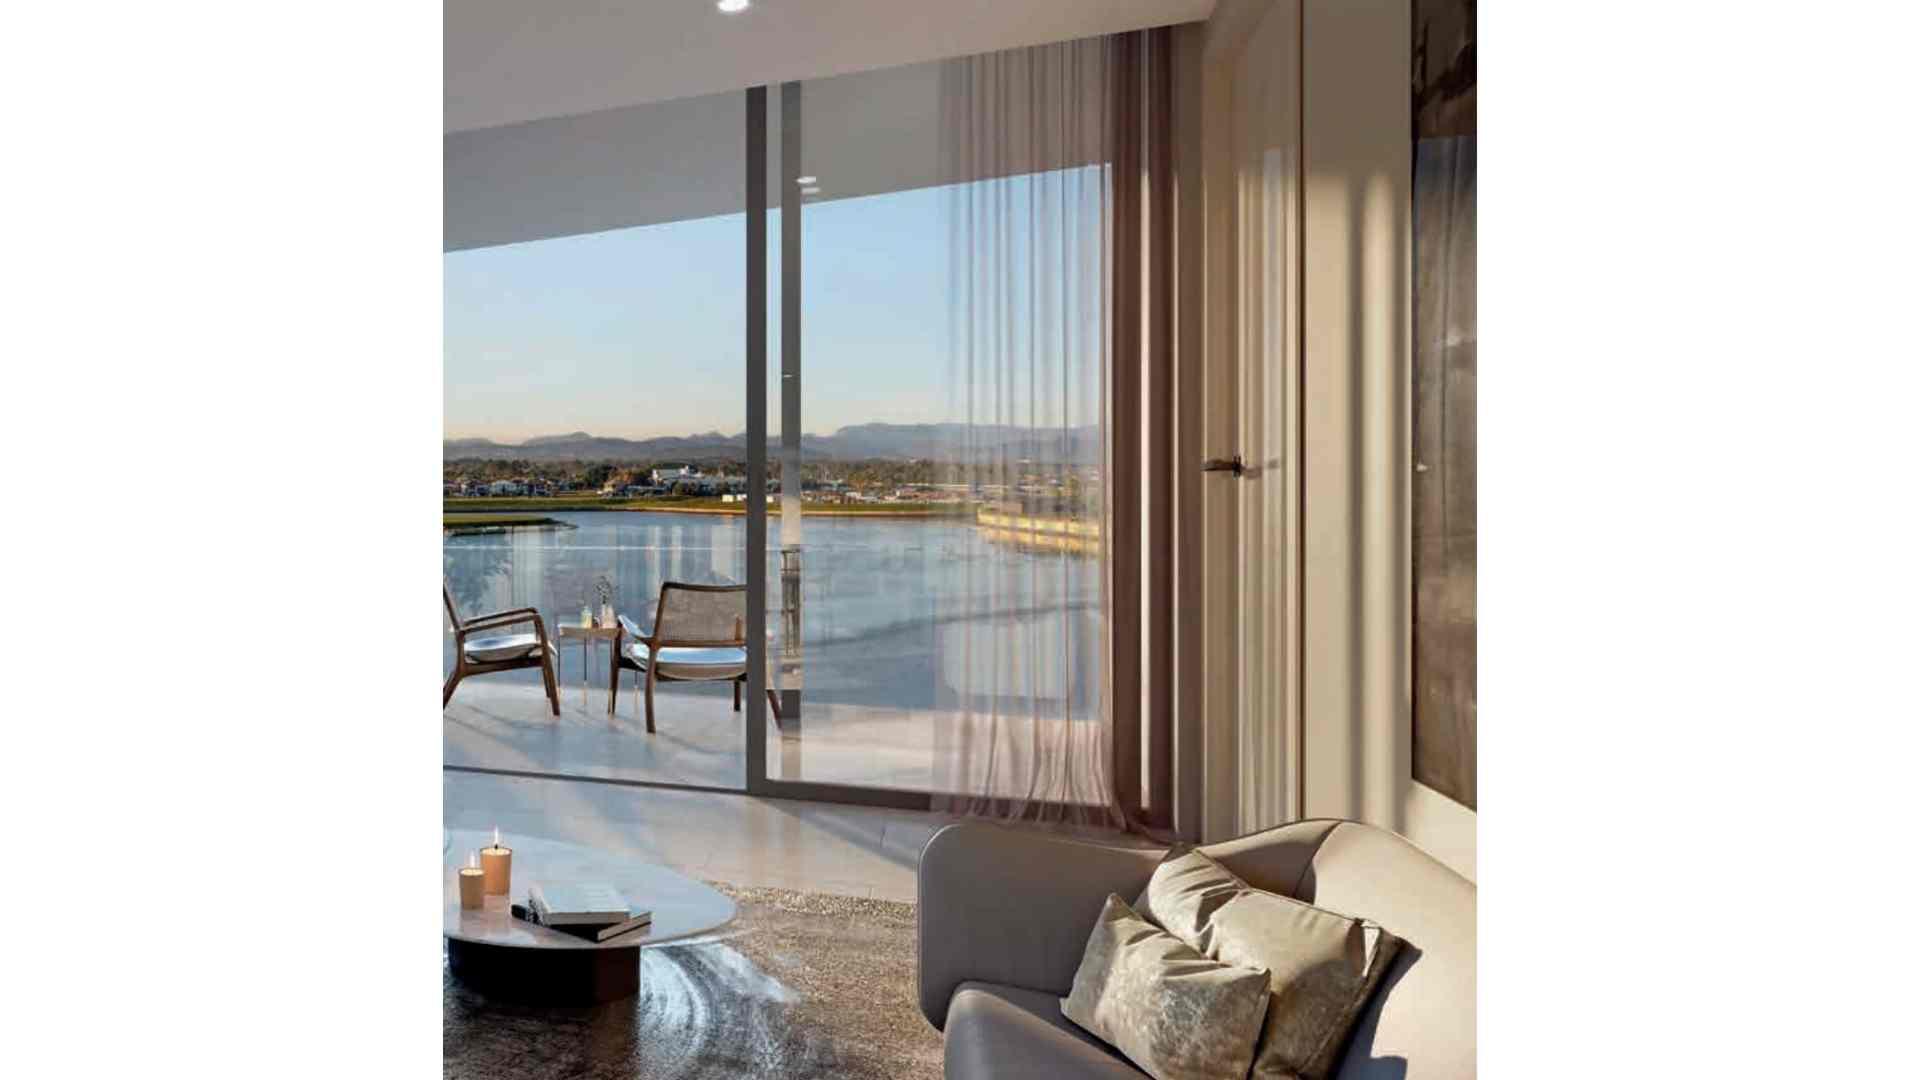 grey sofa on rug by the balcony